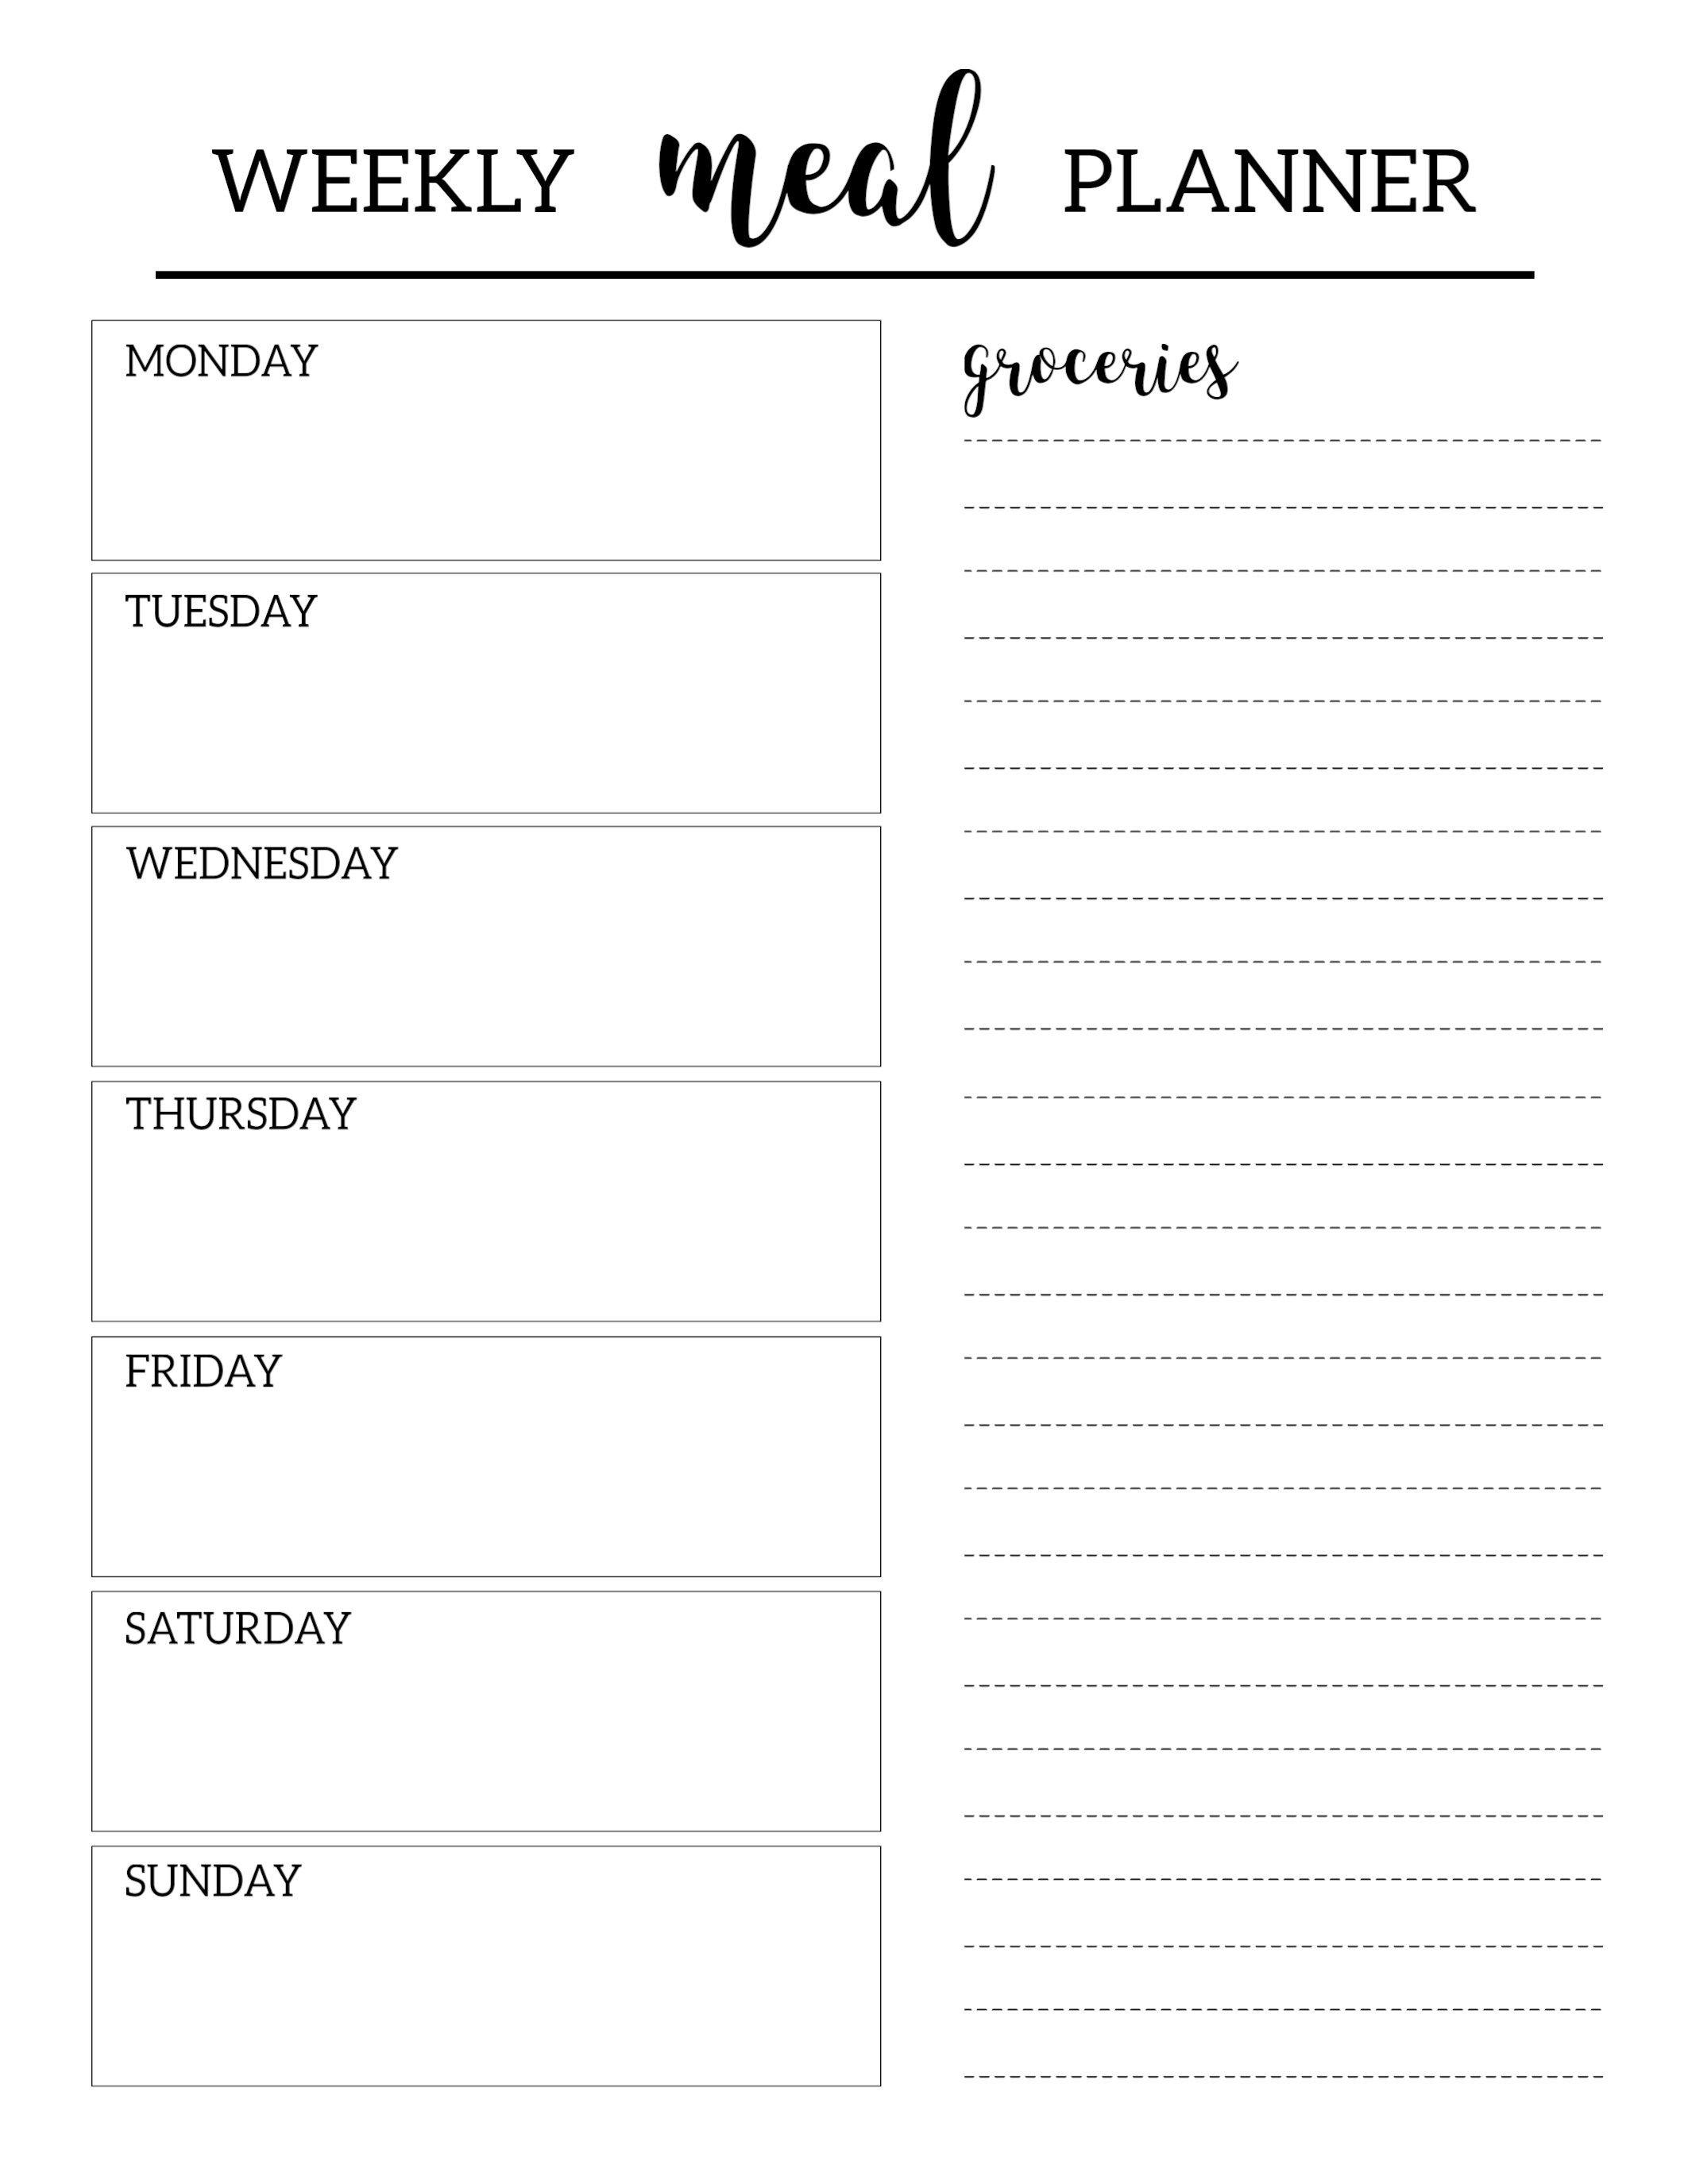 Free Printable Meal Planner Template   Organization   Pinterest - Free Printable Templates